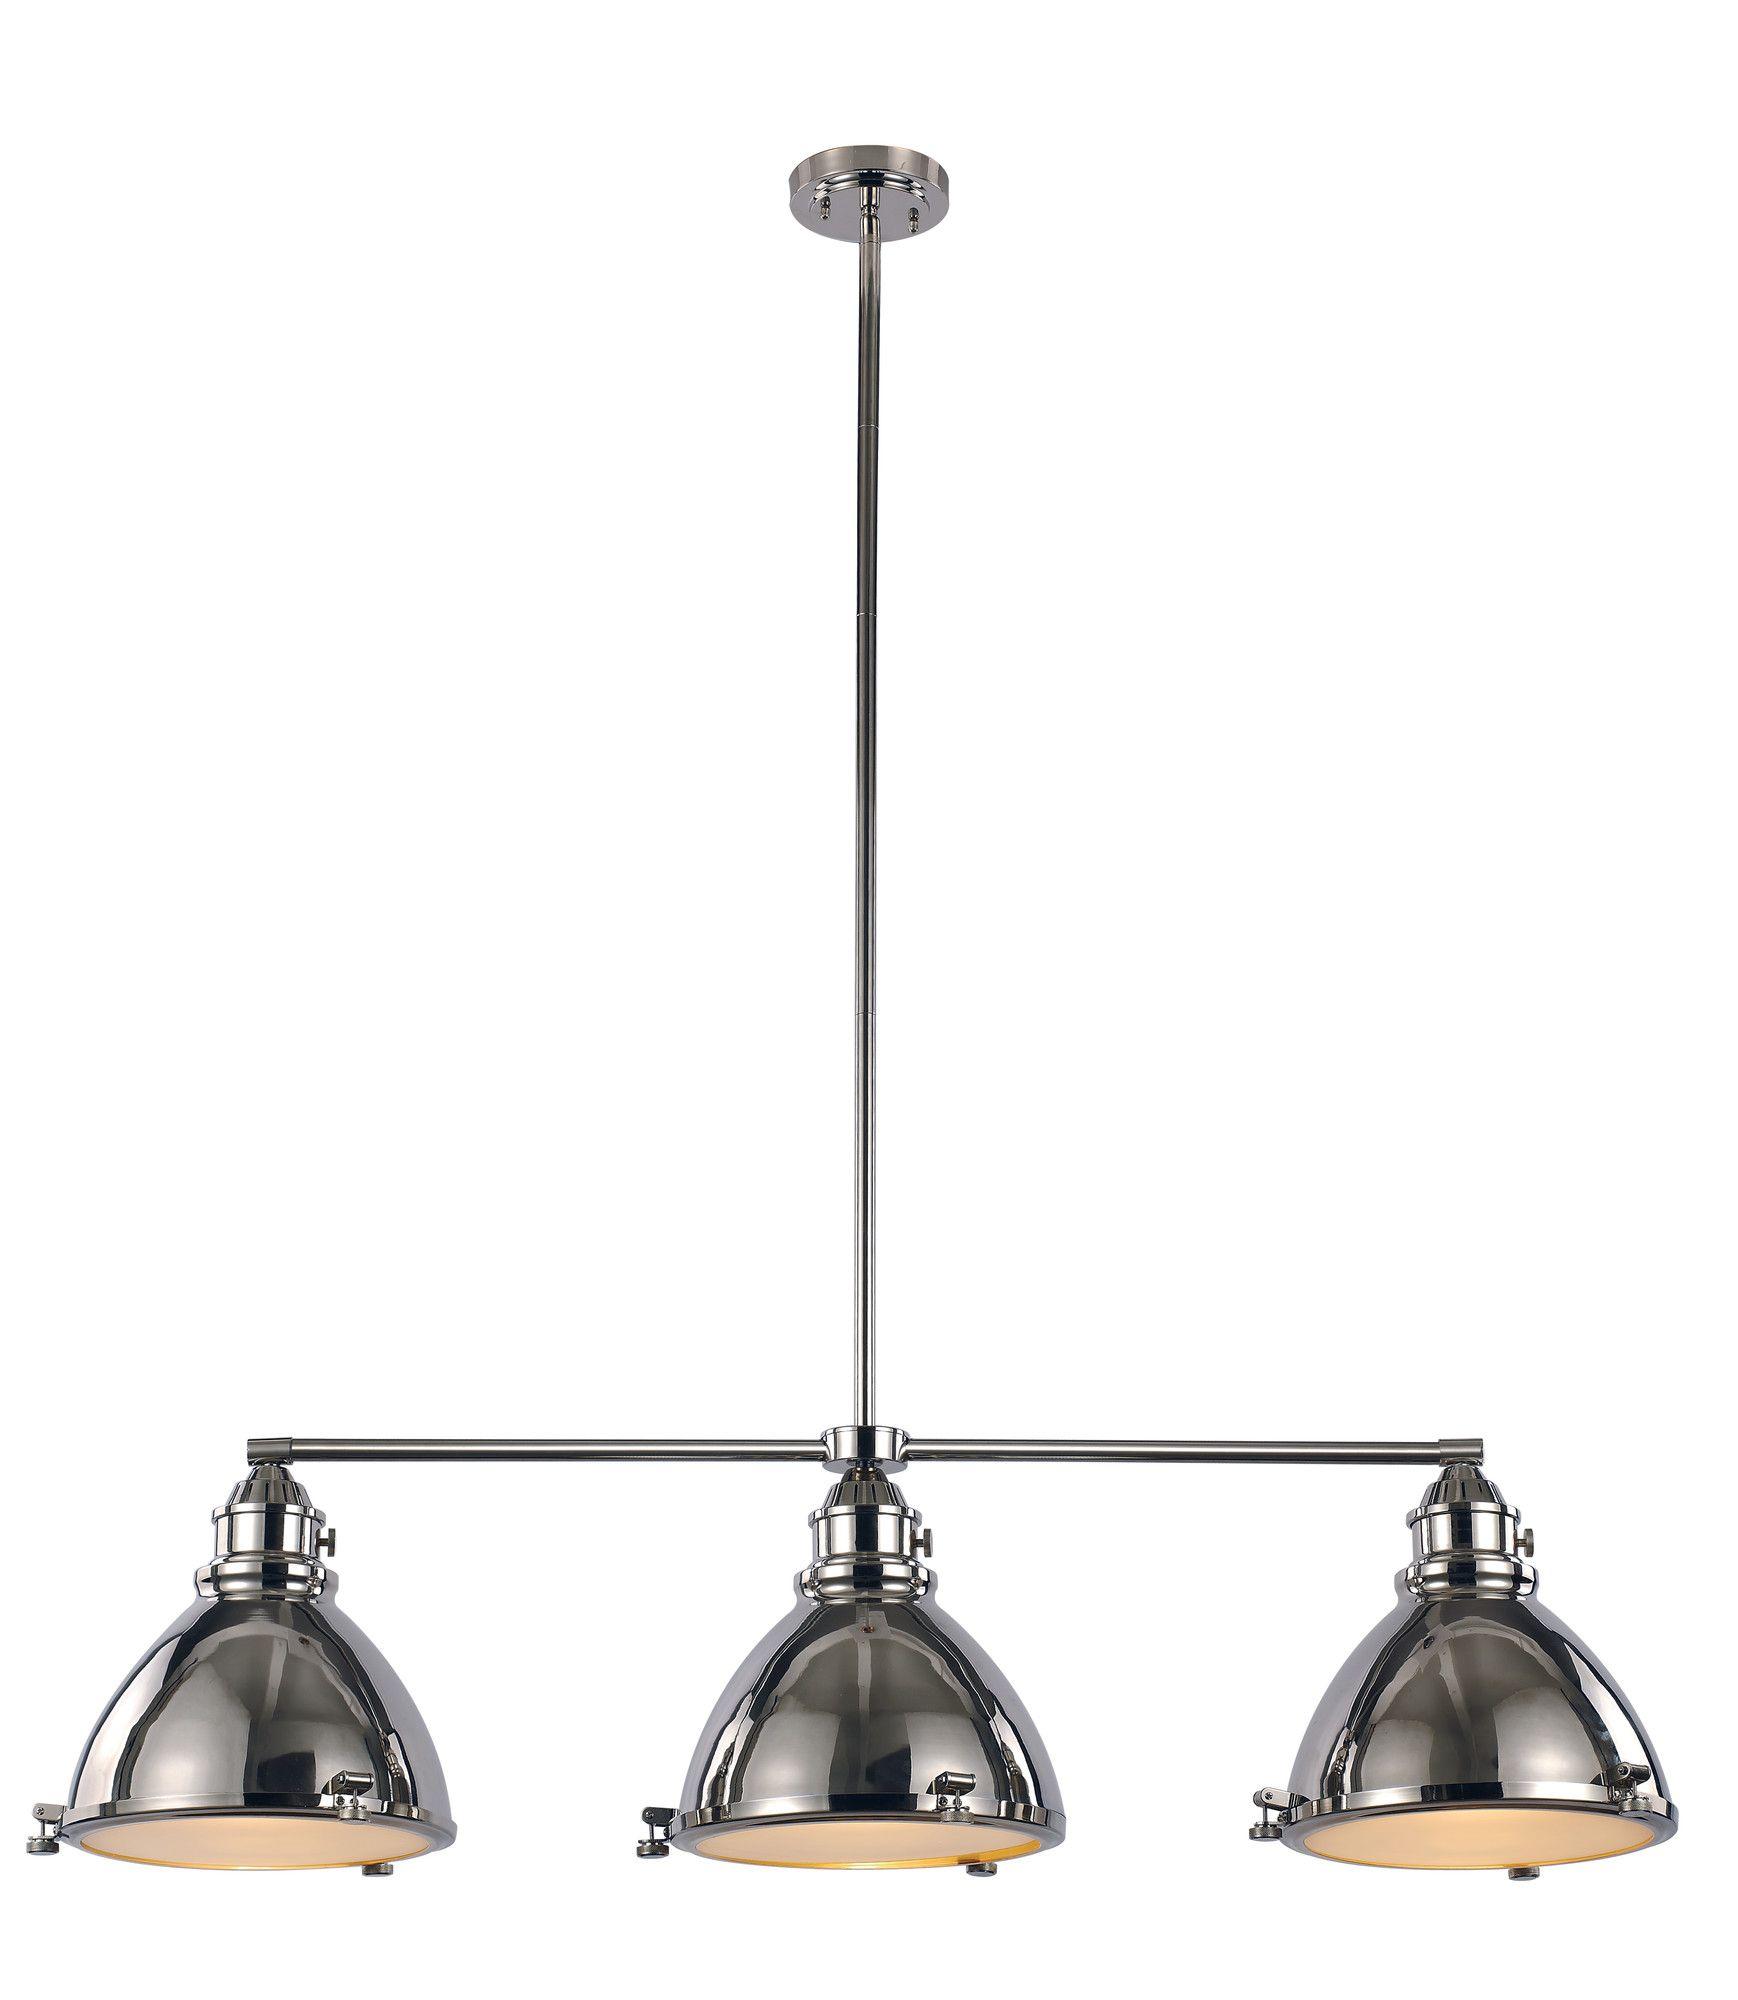 Transglobe lighting vintage light kitchen island pendant u reviews